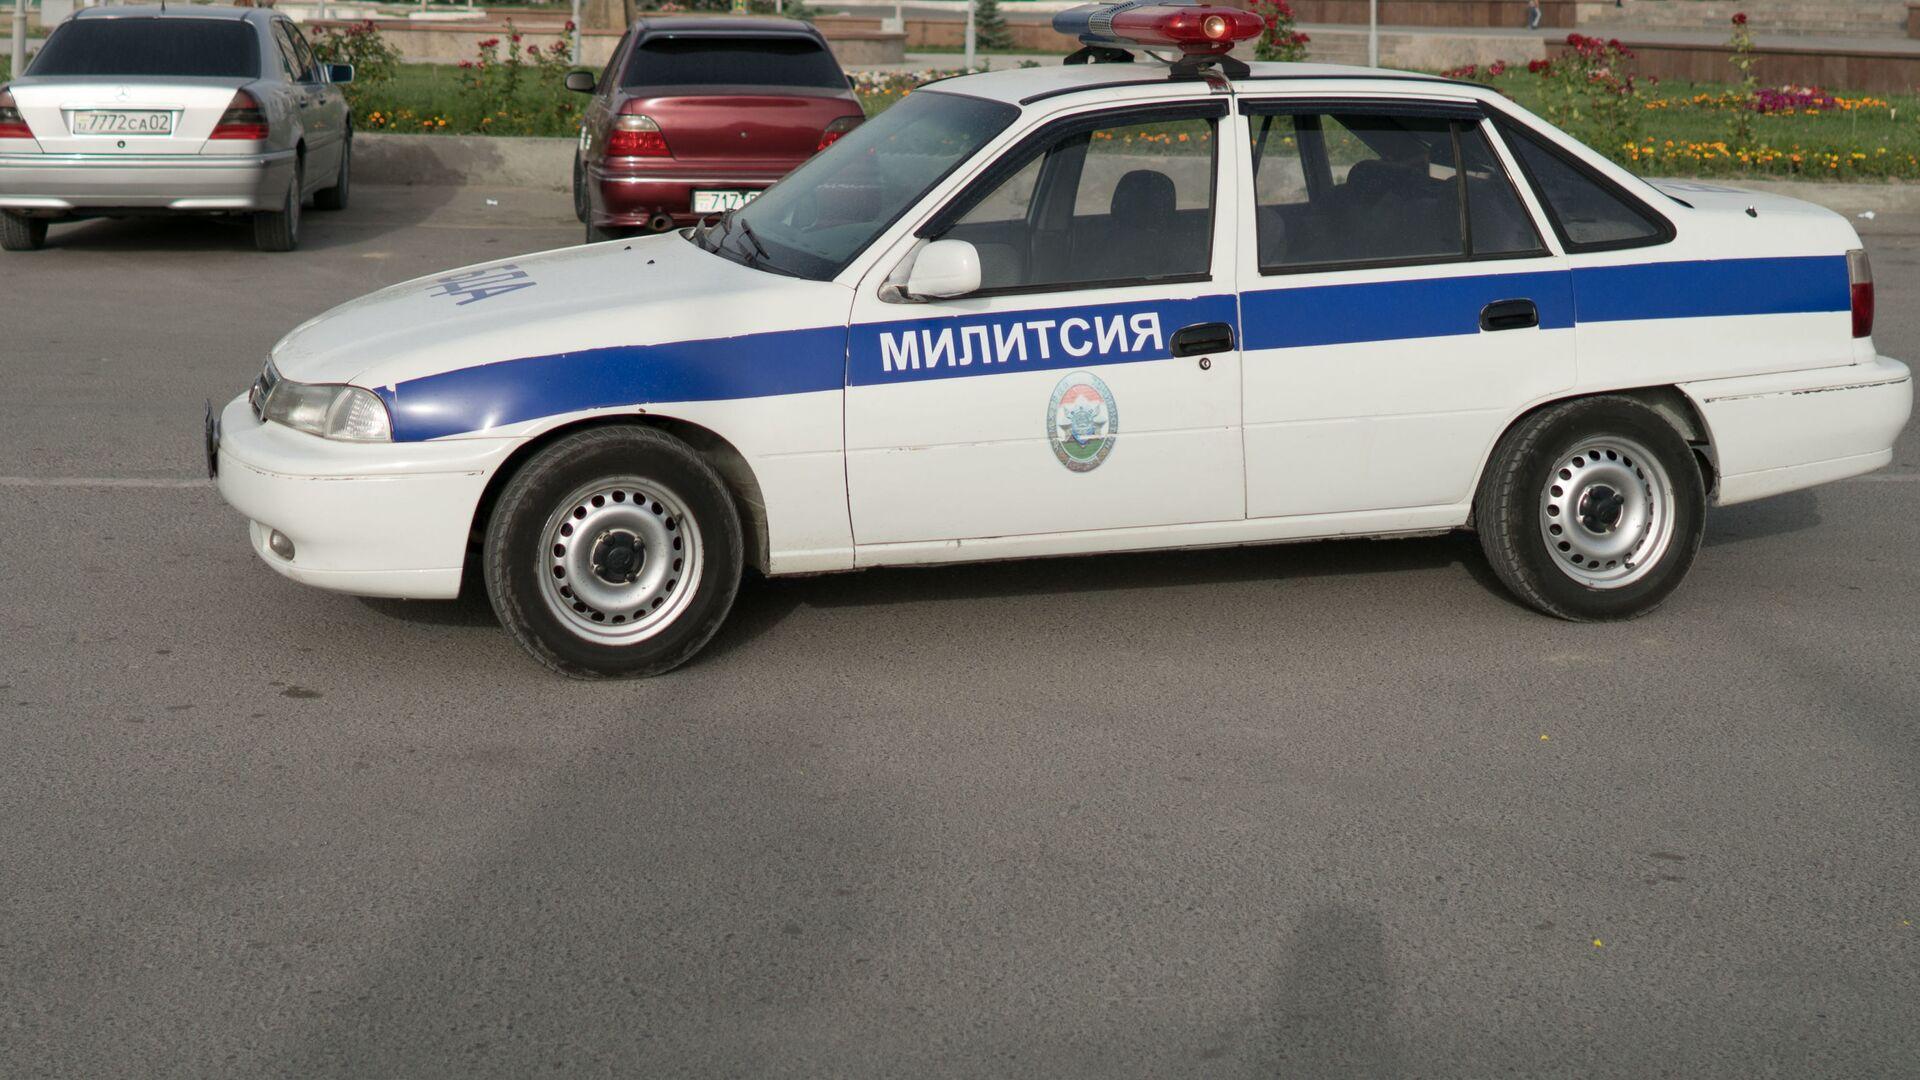 Машина милиции в Таджикистане, архивное фото - Sputnik Тоҷикистон, 1920, 06.09.2021